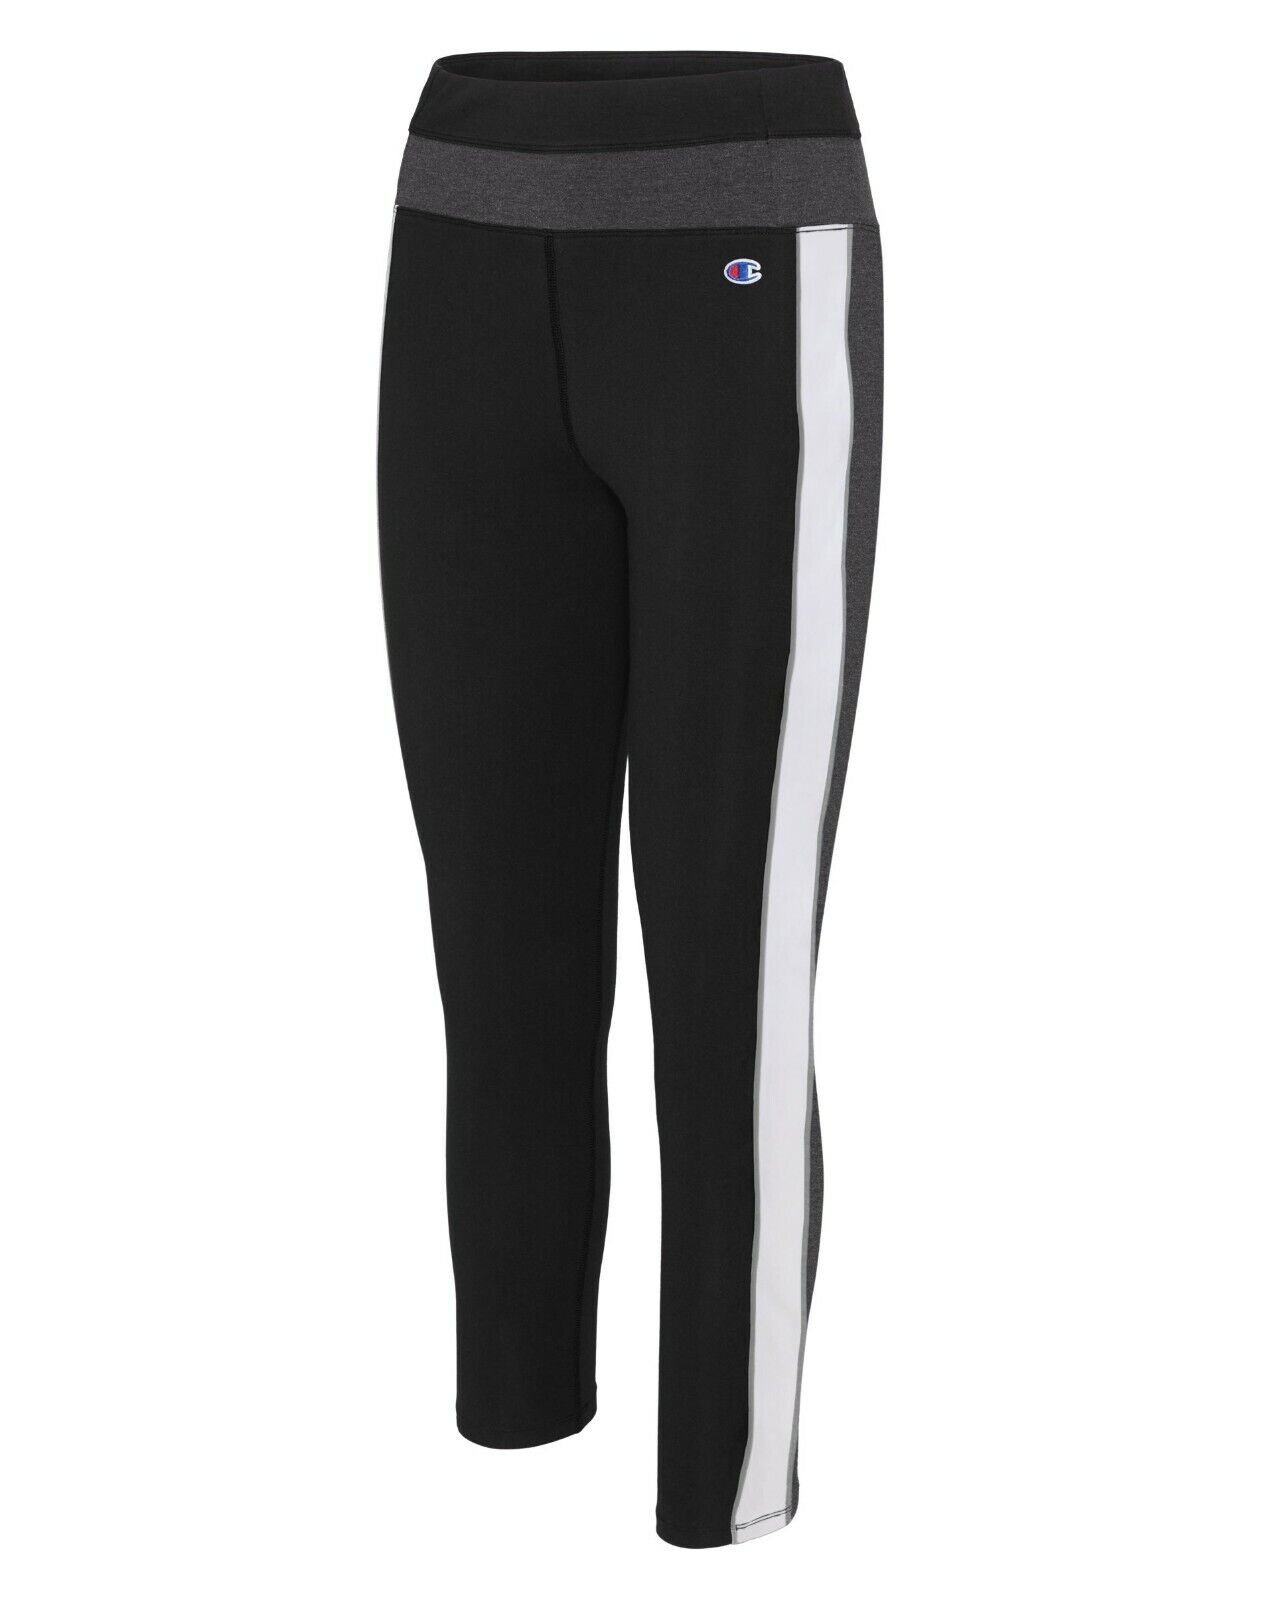 Nwot Champion Womens Black Stretch Athletic 7 8 Leggings Pants Size M Ebay